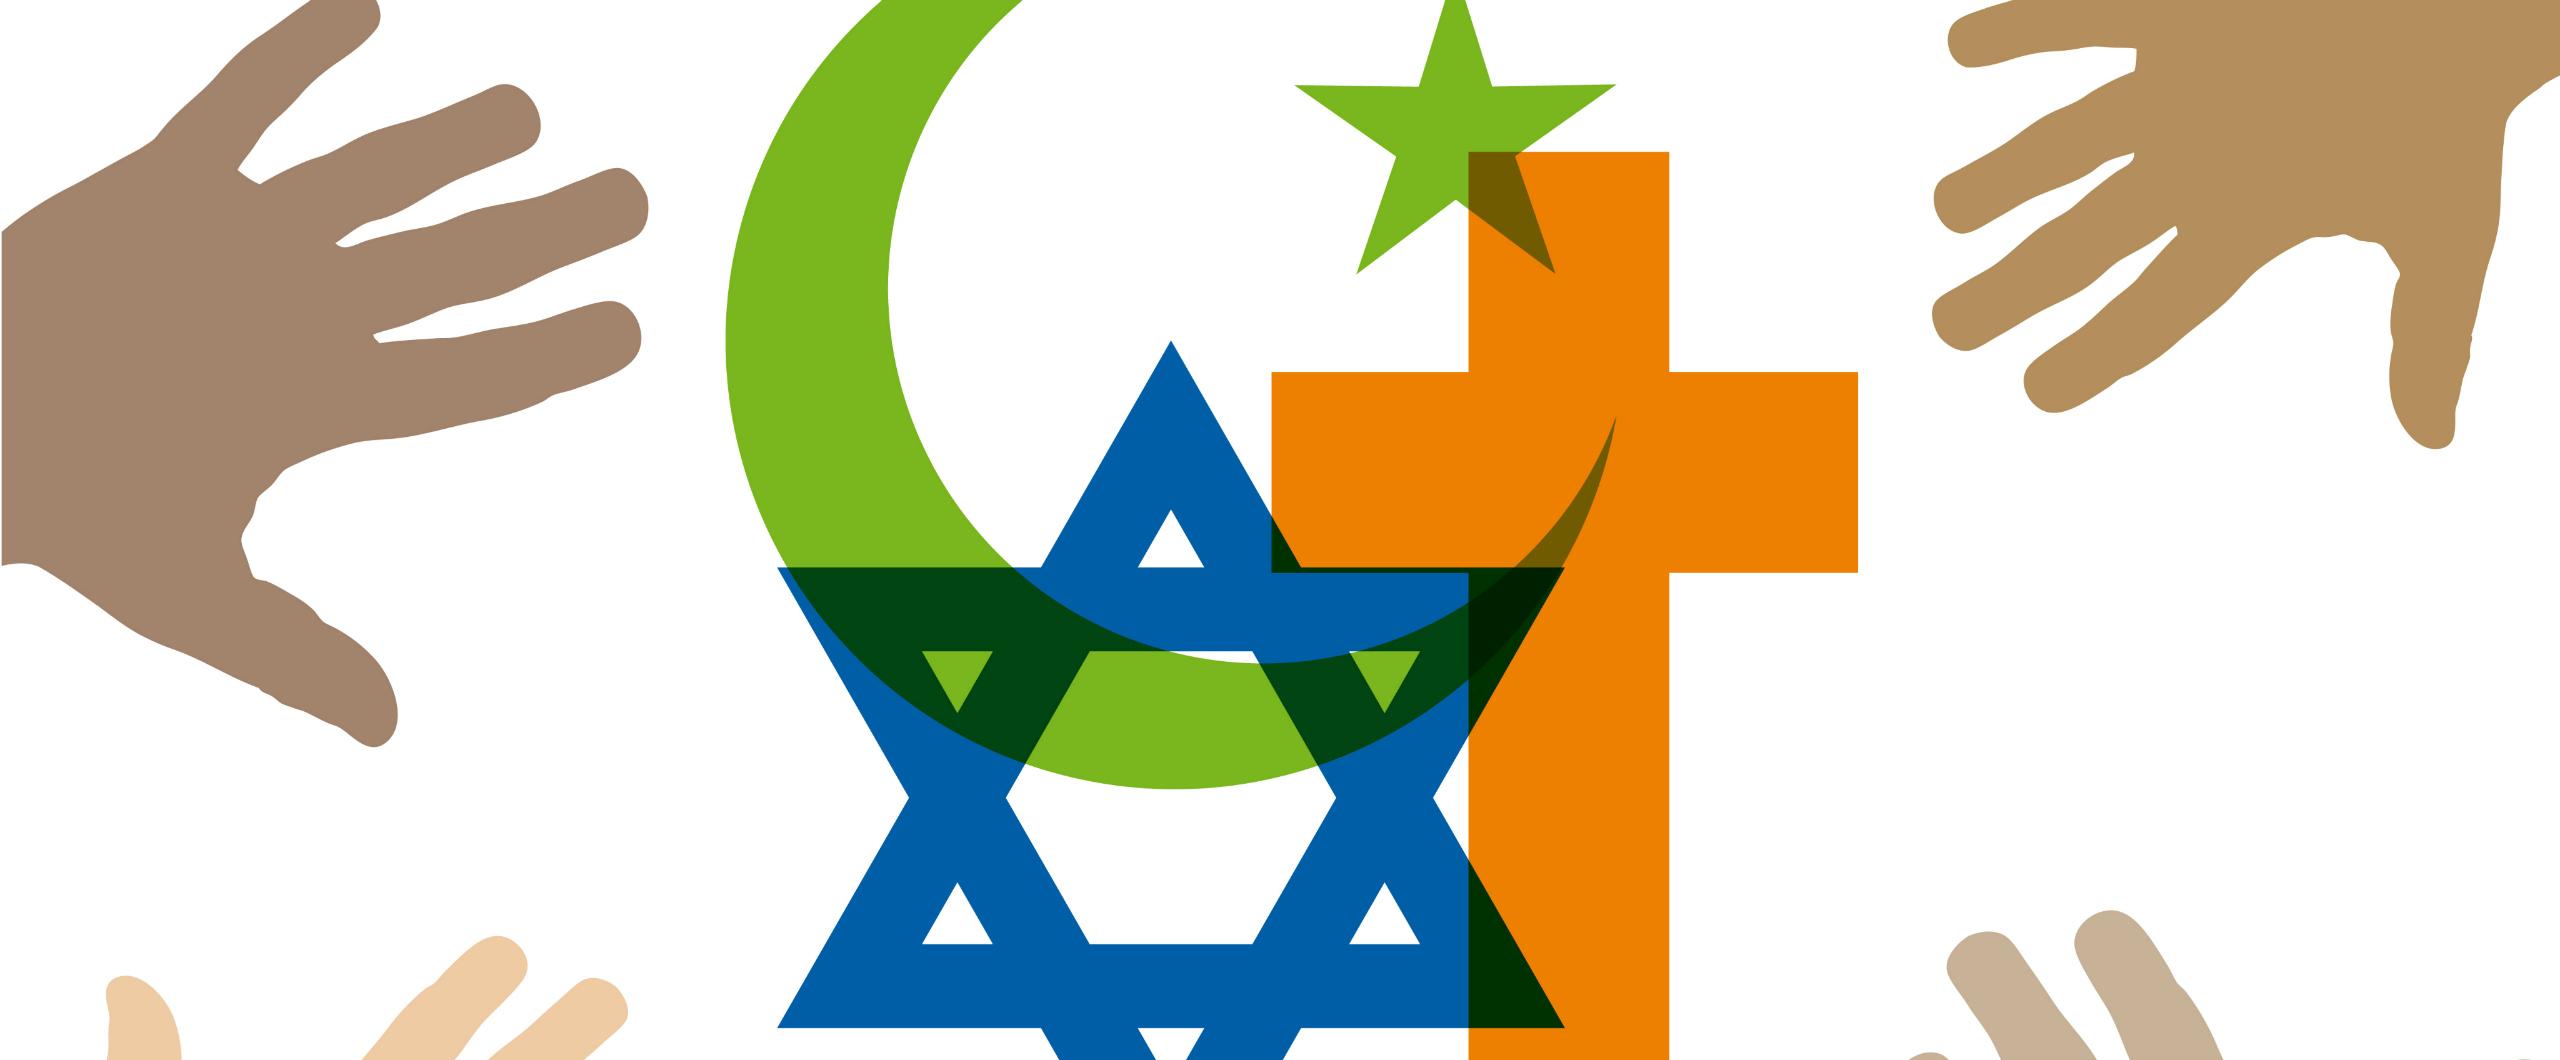 Religions in the UAE